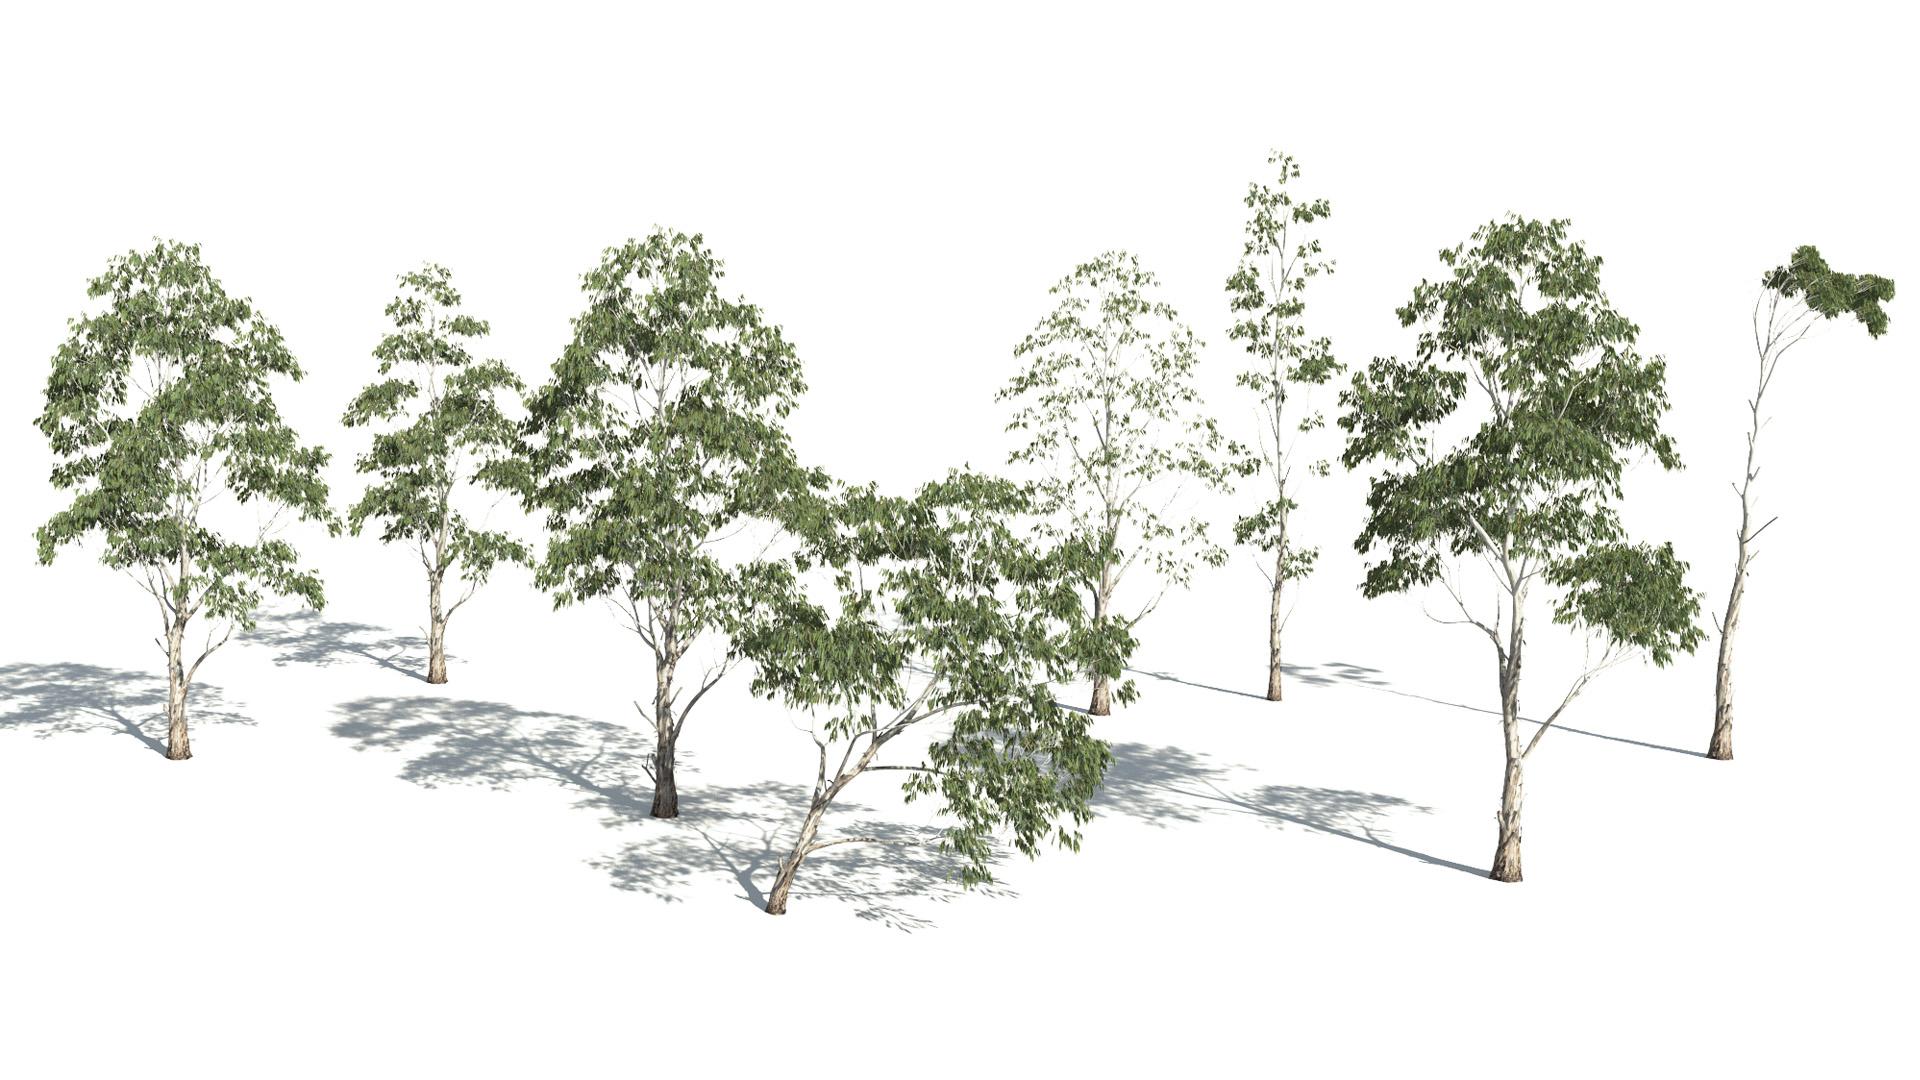 3D model of the Red river gum Eucalyptus camaldulensis published parameters